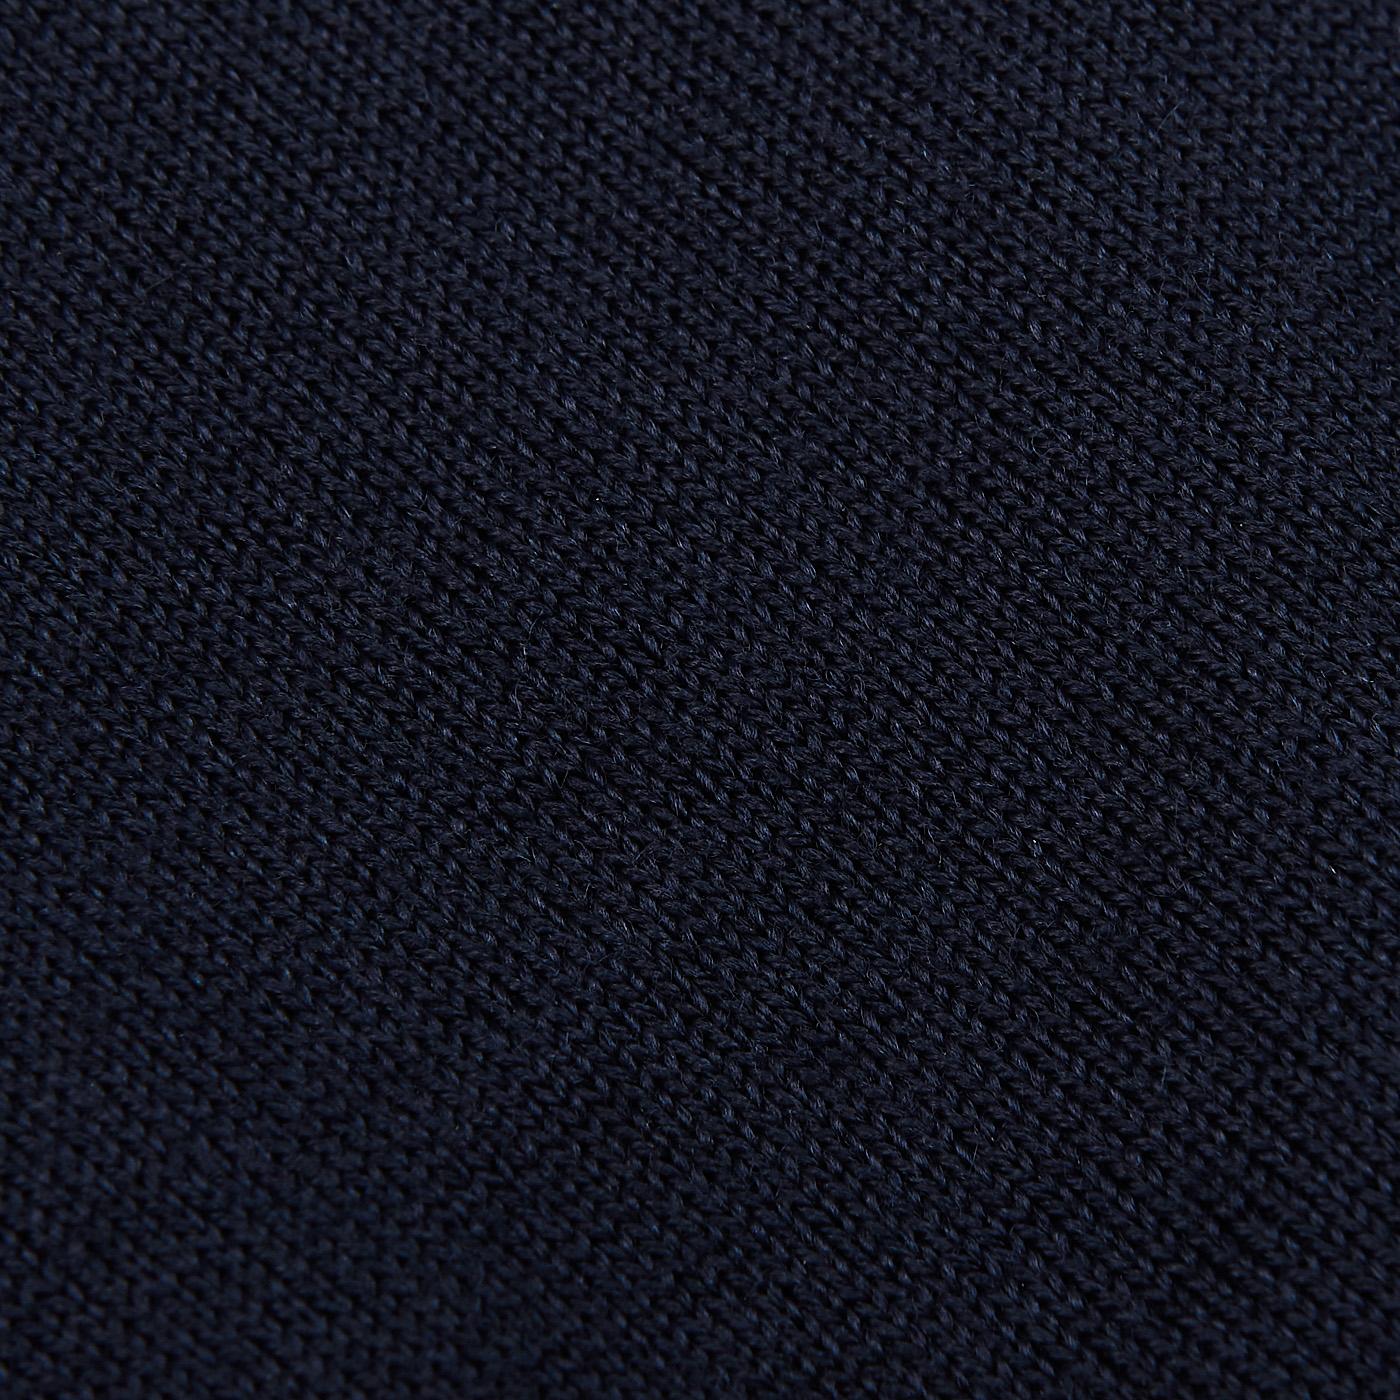 Stenströms Navy Zegna Baruffa Merino Wool Polo Shirt Fabric